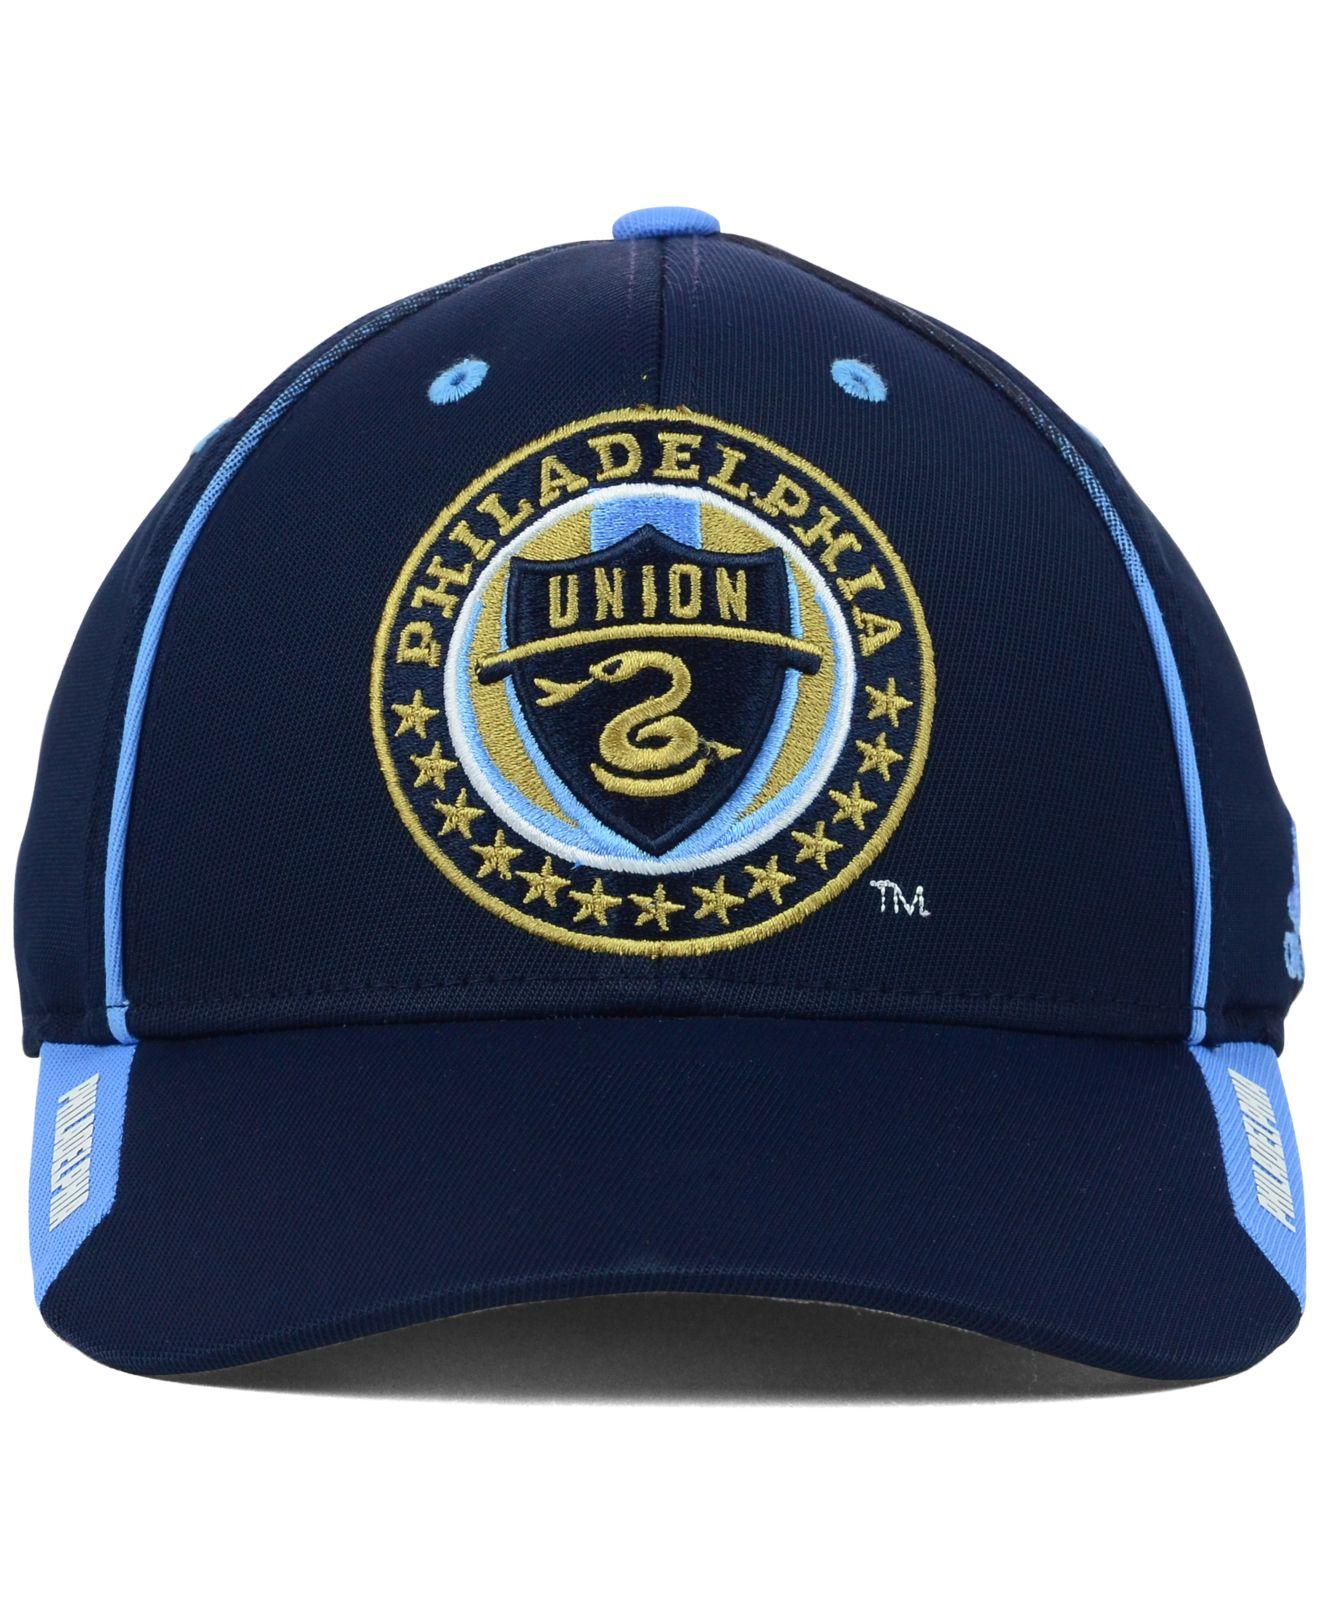 cheap for discount 7fb21 87ae4 adidas Philadelphia Union Mls Mid Fielder Cap in Blue for Men - Lyst